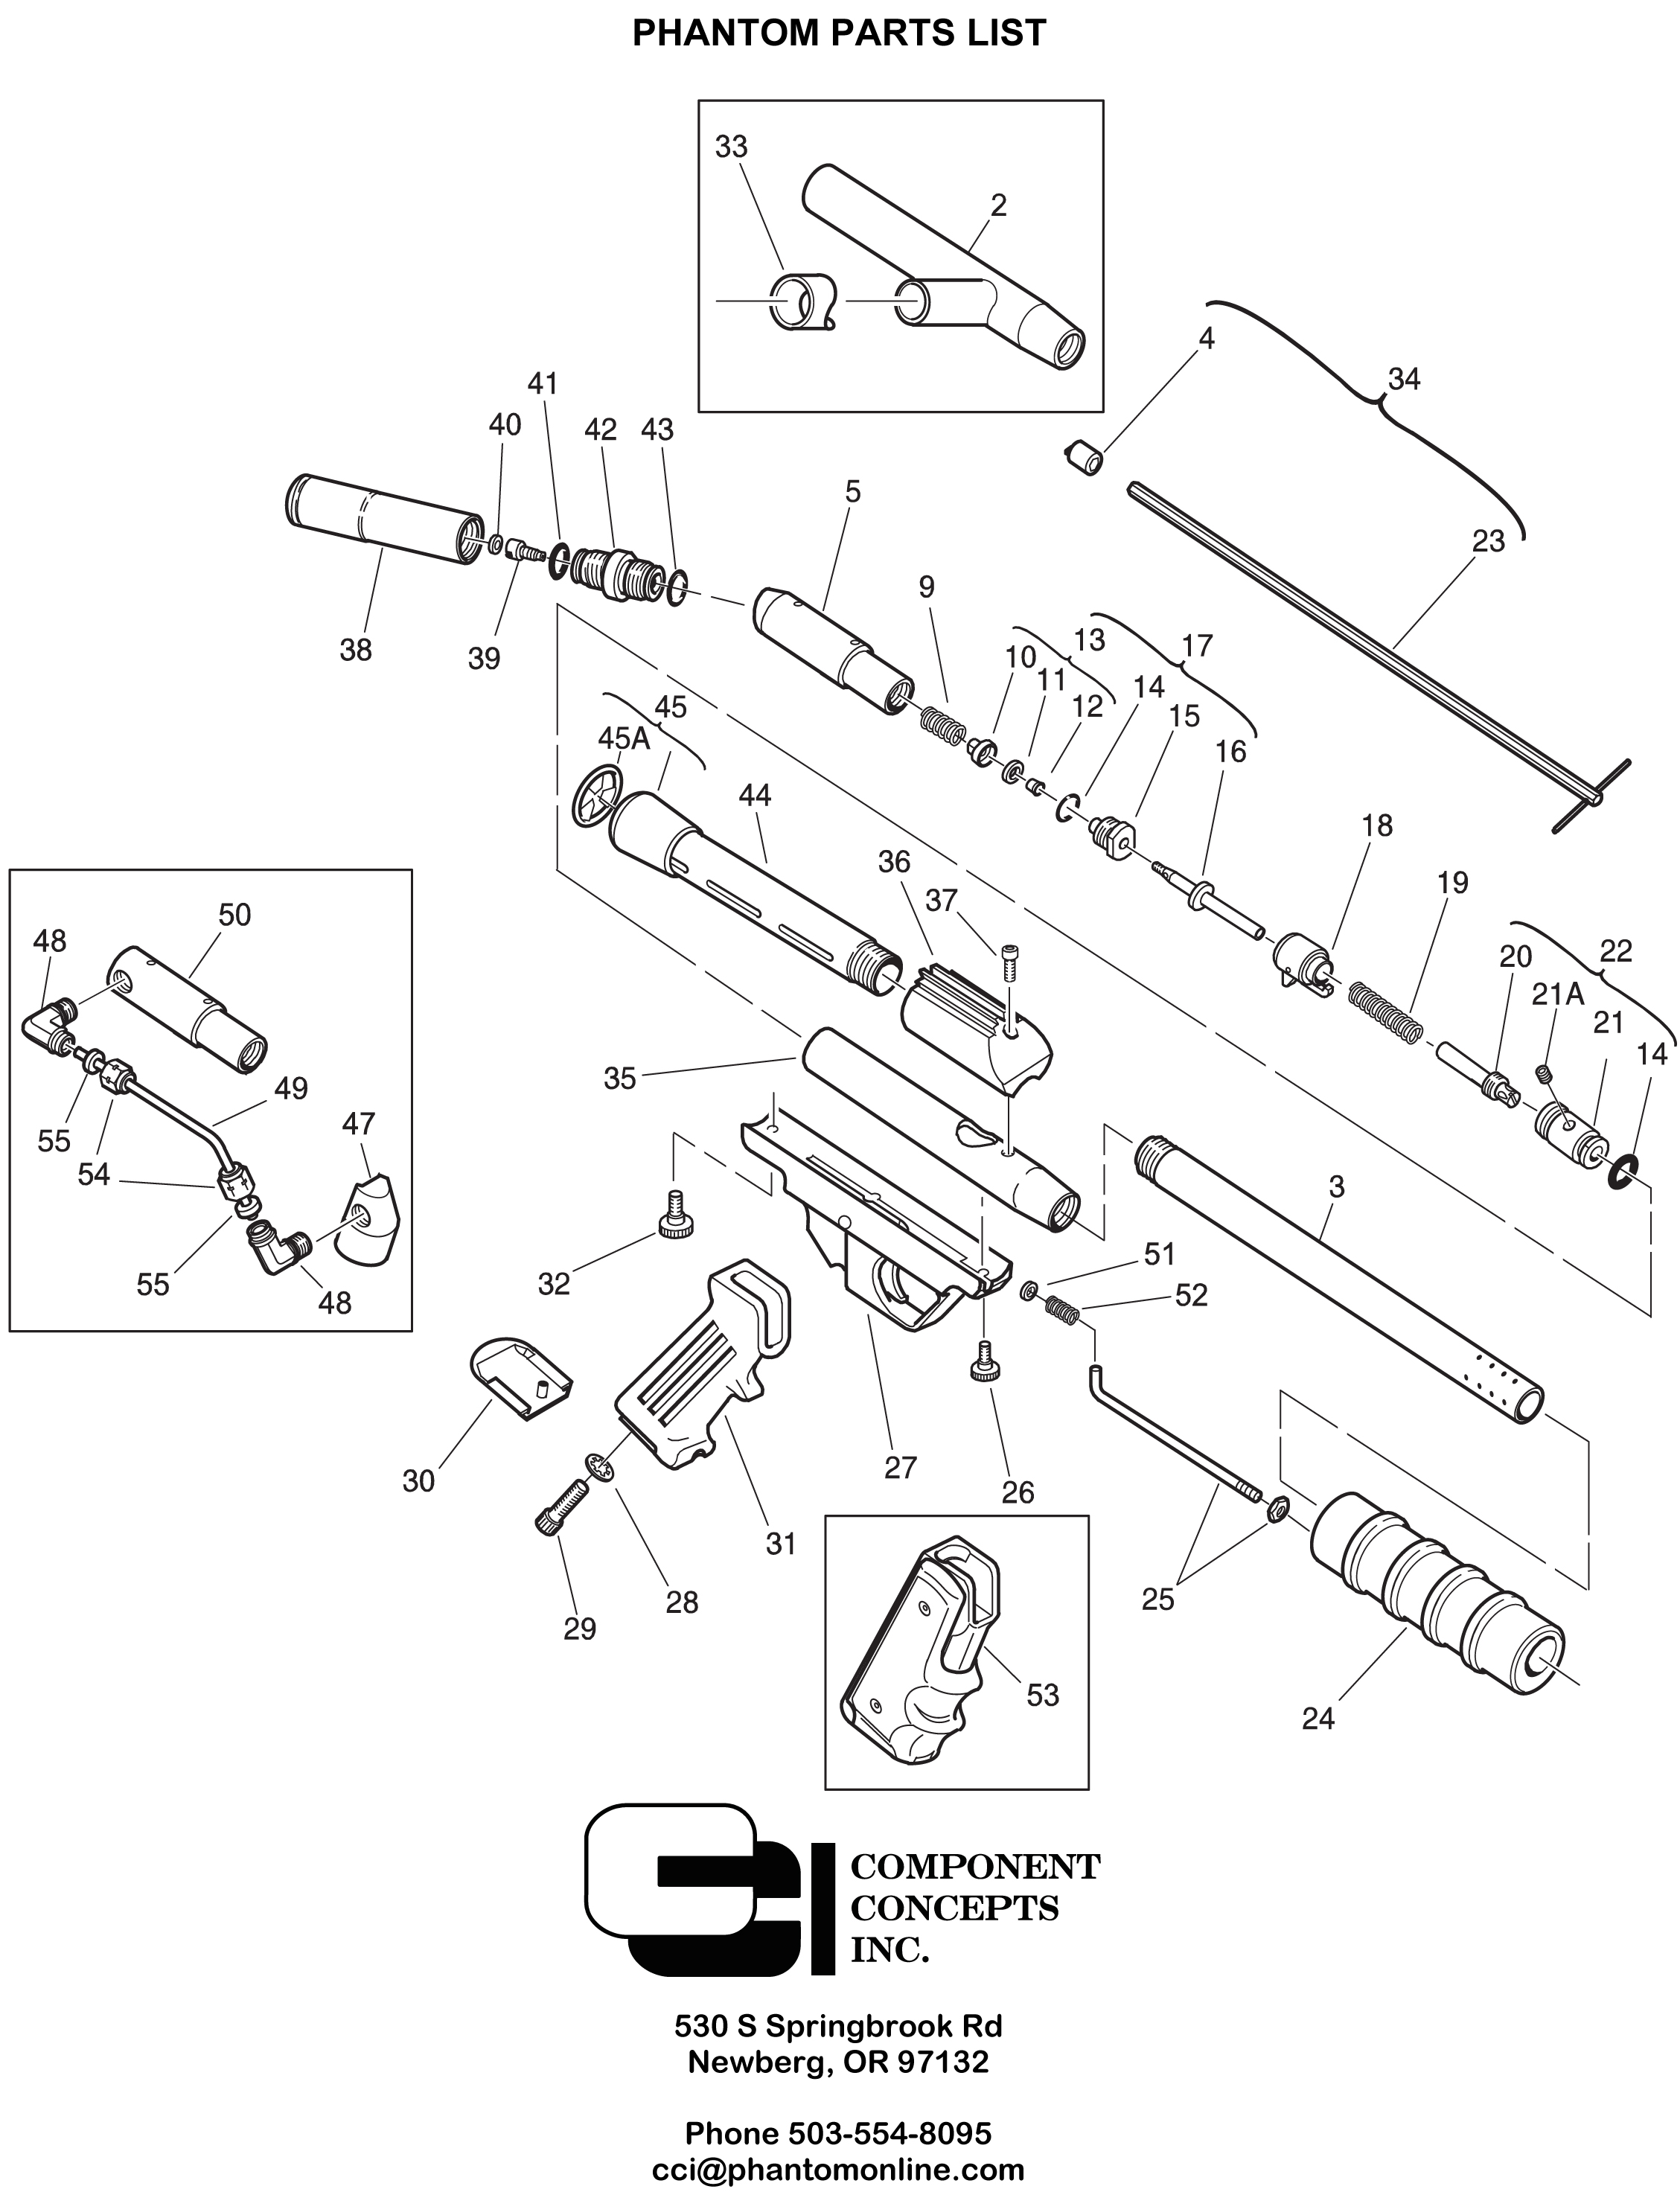 Tuned Port Compensator w/ O-ring